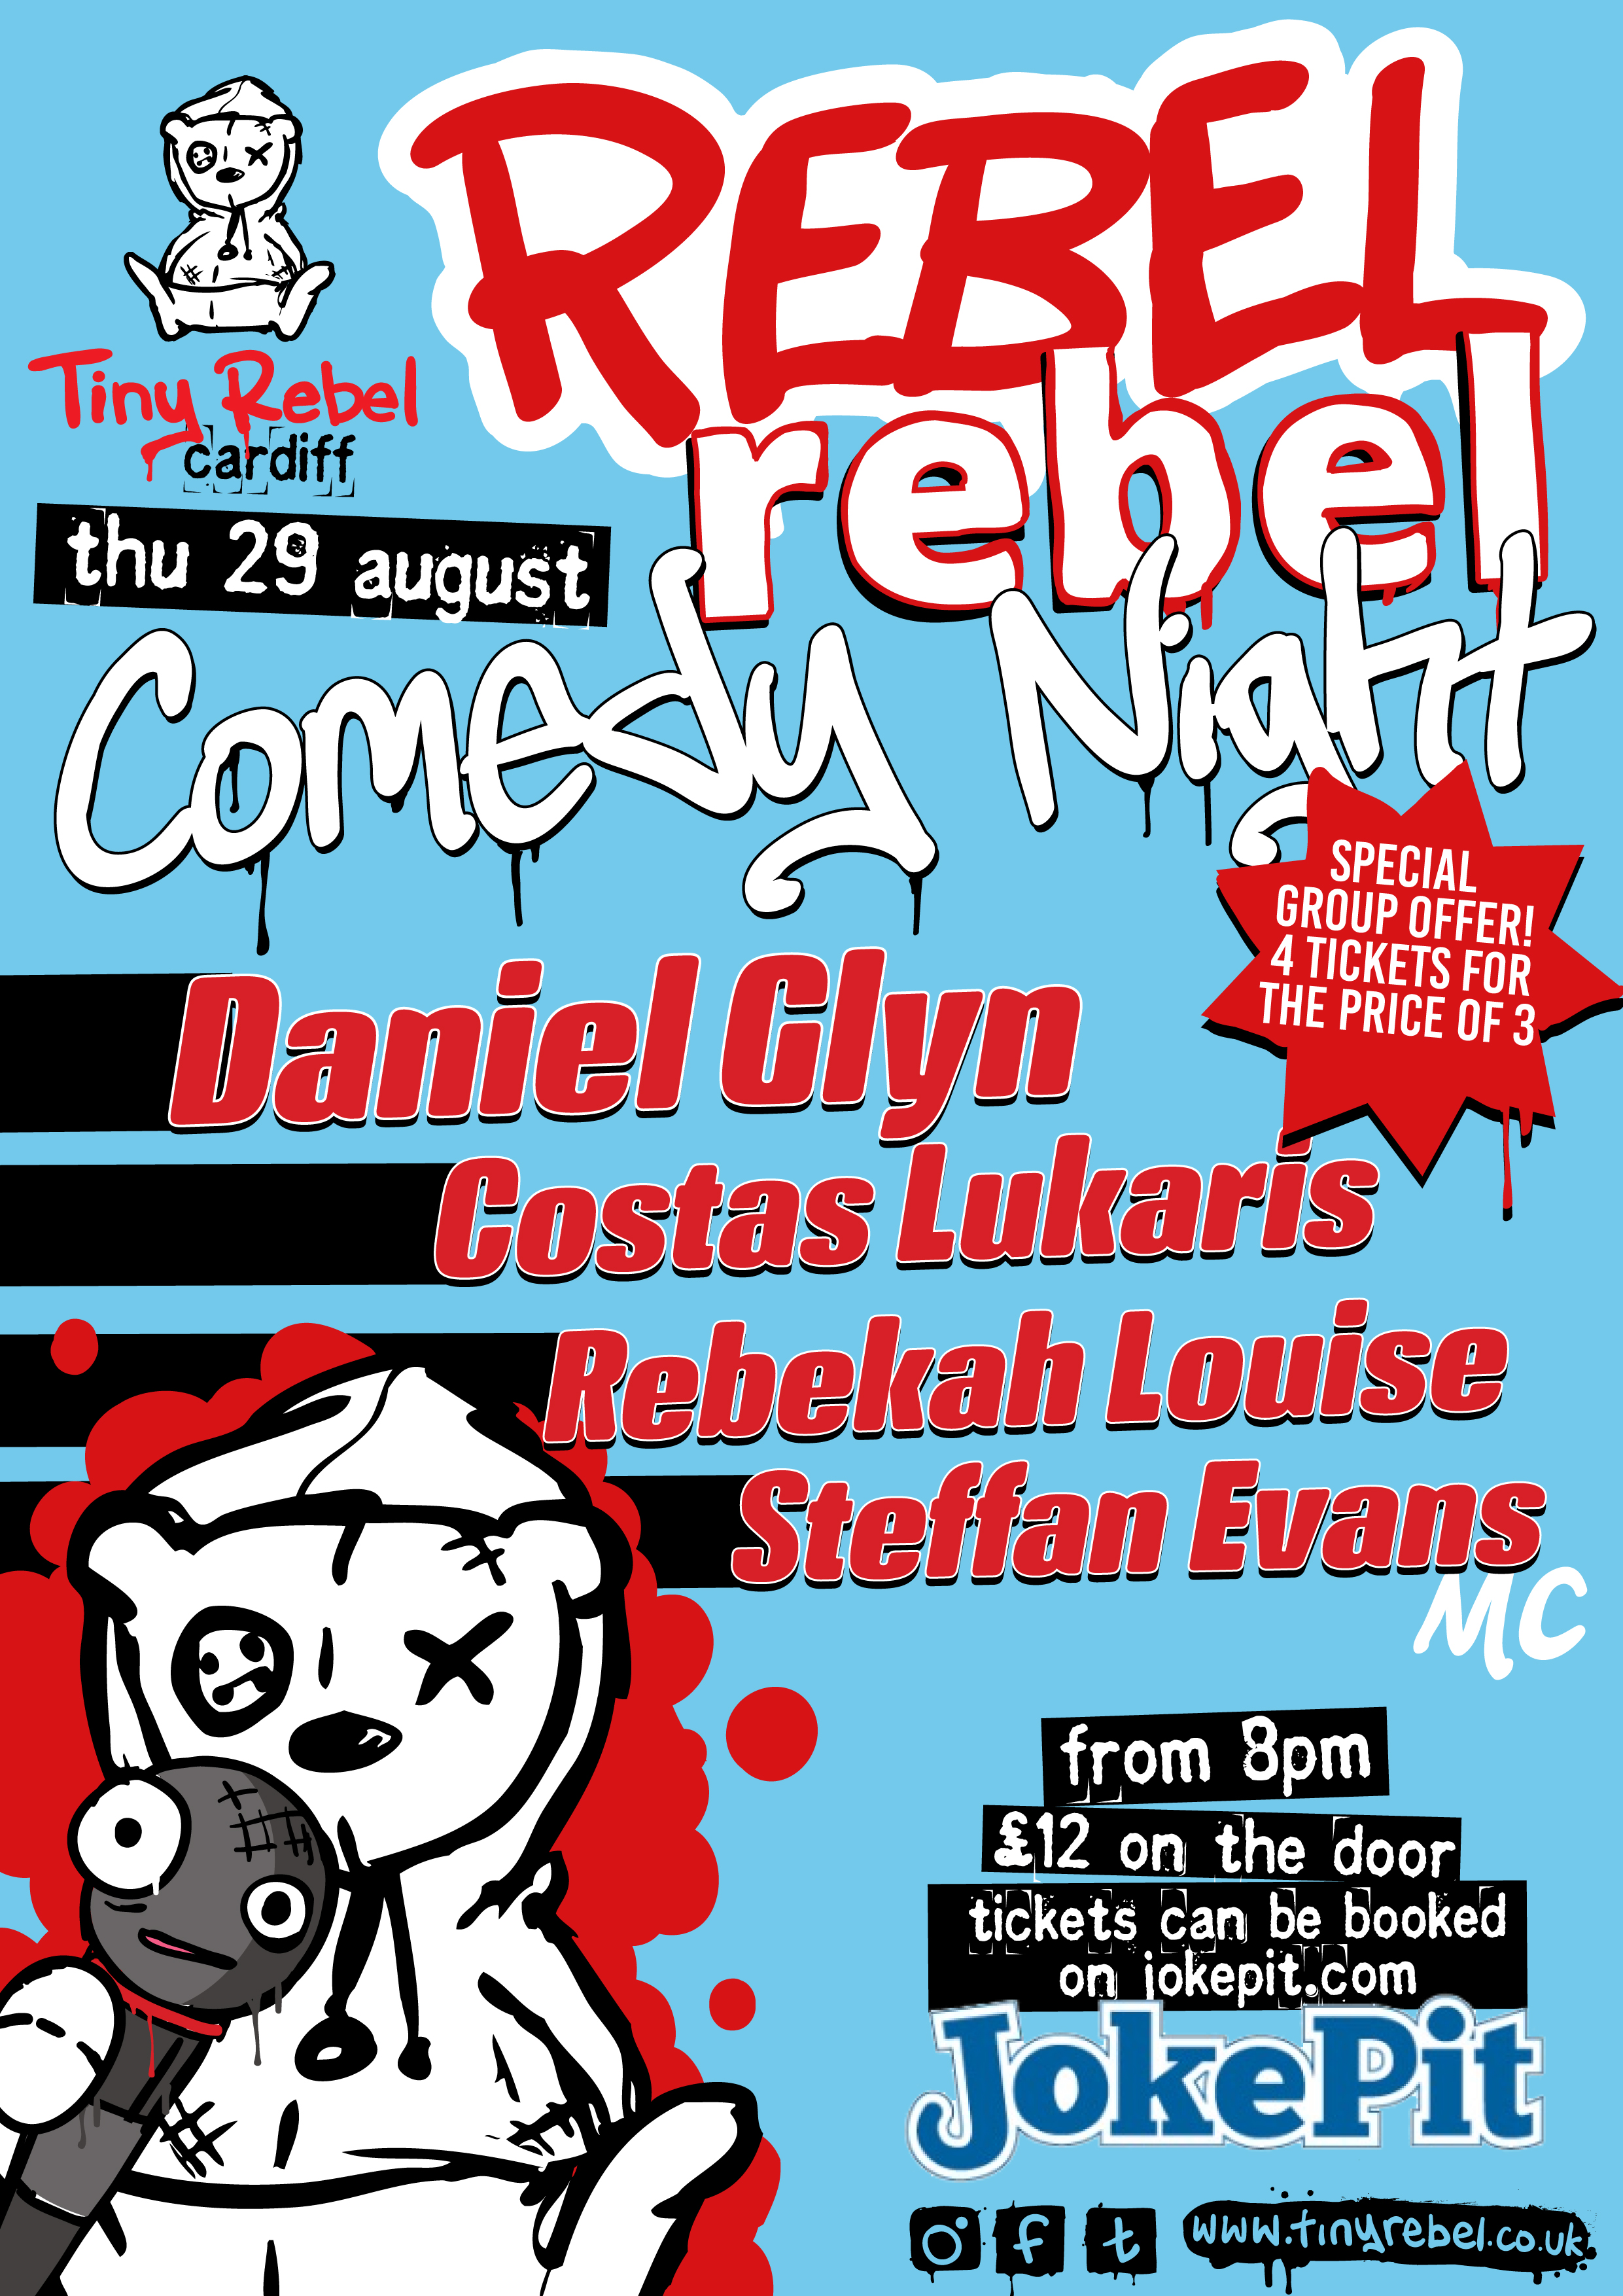 Trc rebelrebel comedy aug 13